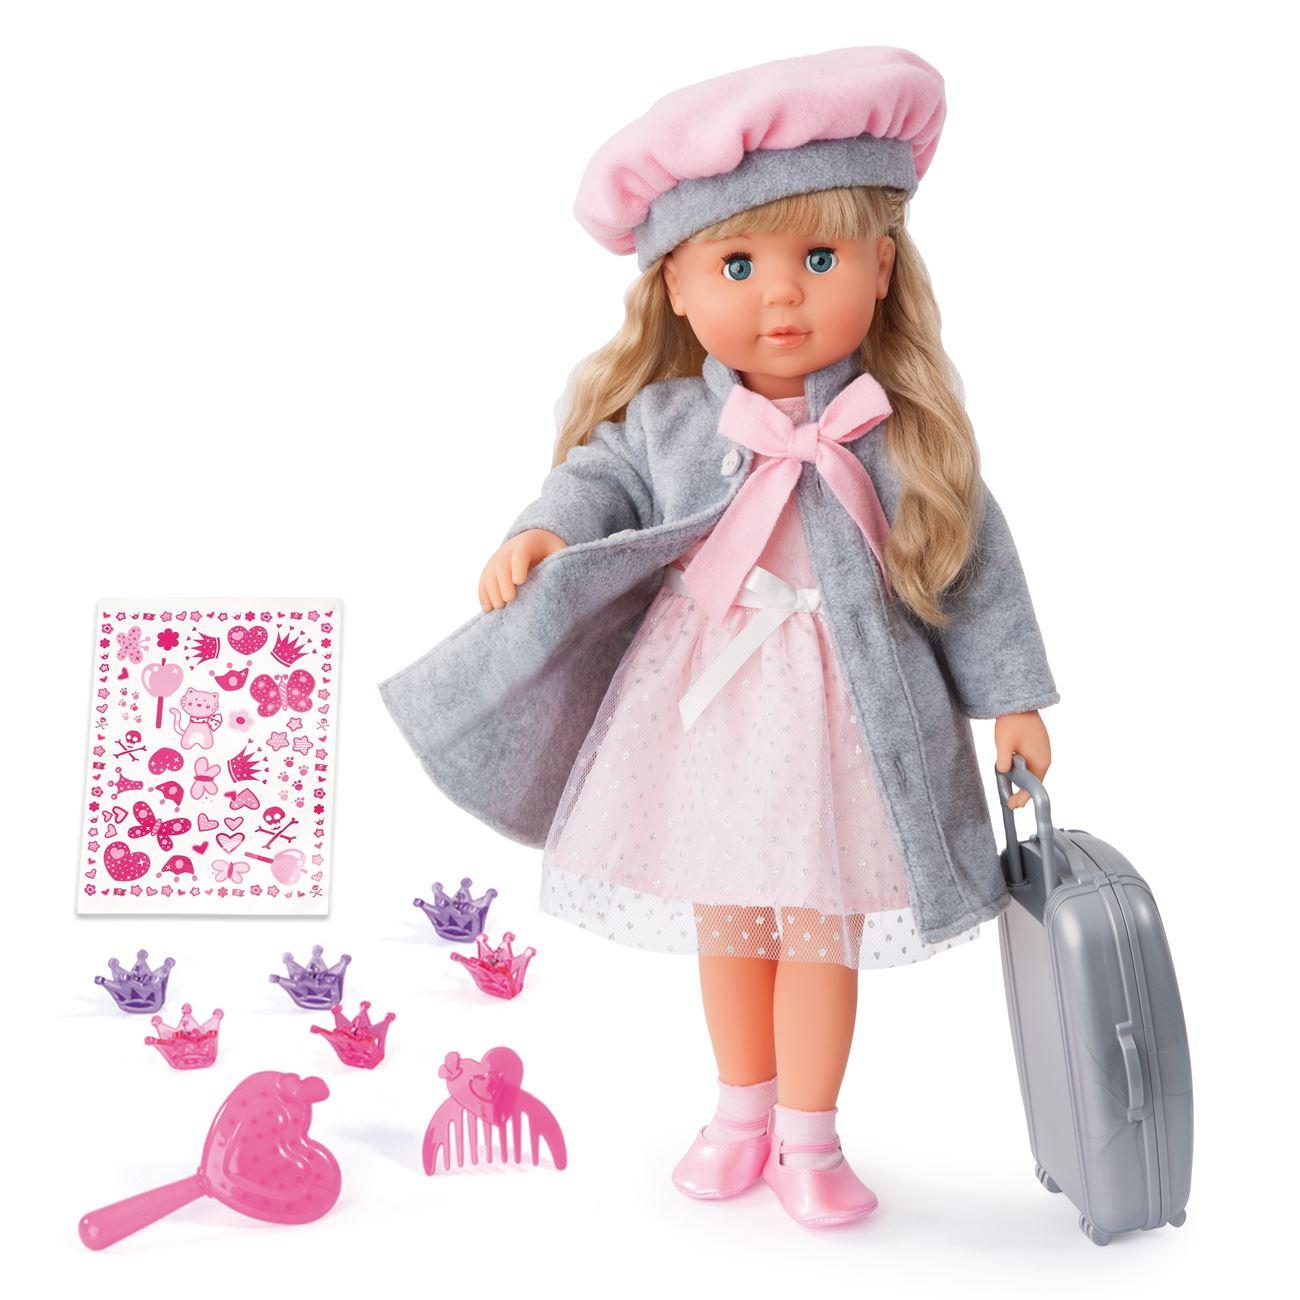 f2c8bbaa2efd Άννα Διαδραστική Κούκλα 46 εκ. (Μιλάει Ελληνικά)   Κούκλες Μπαταρίας ...